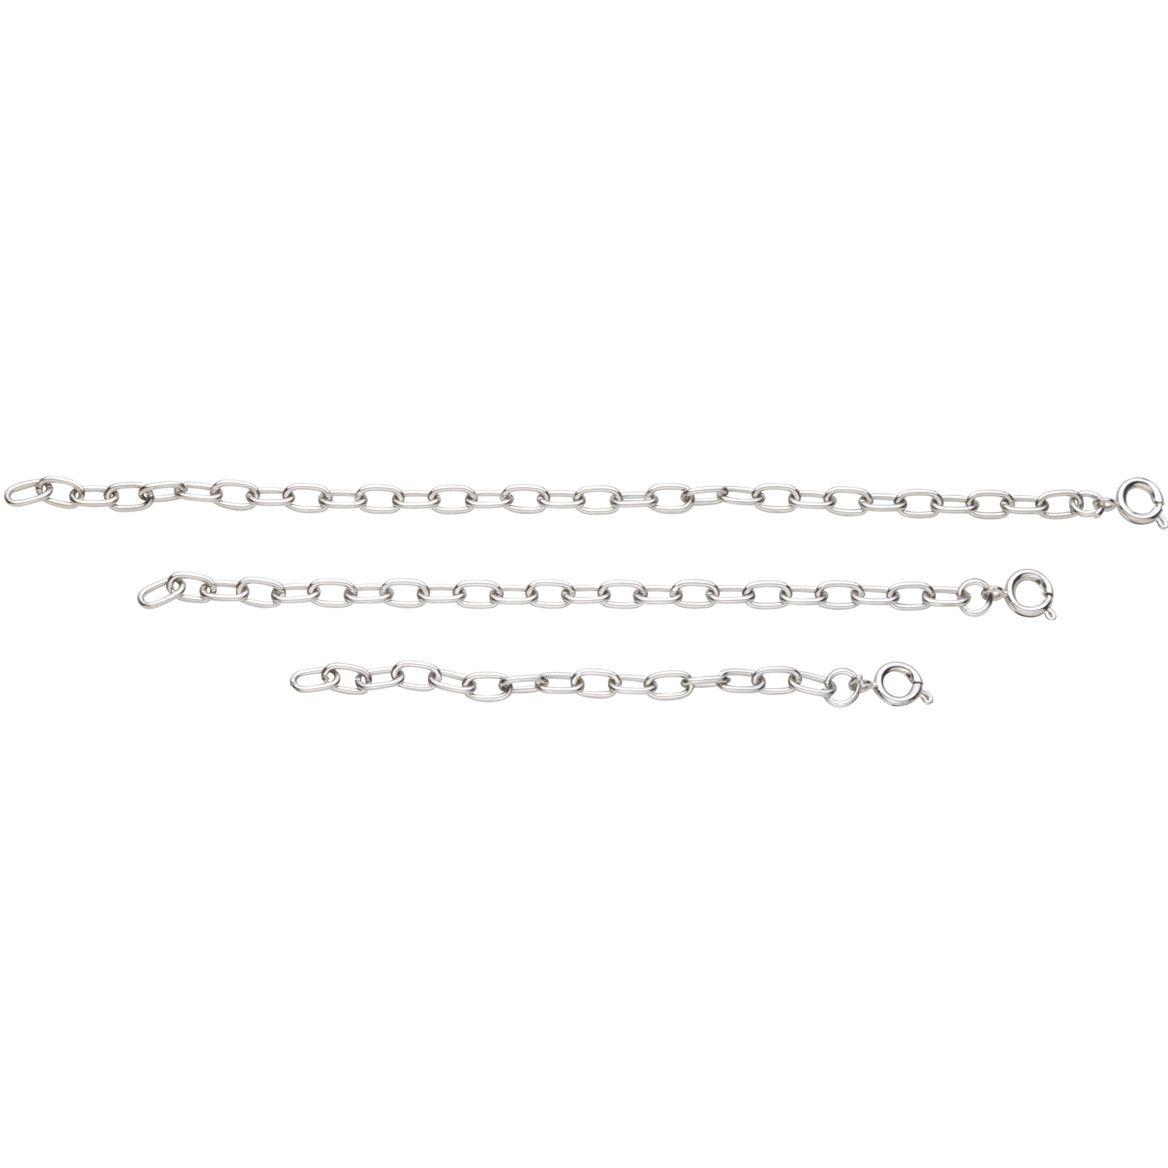 Necklace Extender Set-310558